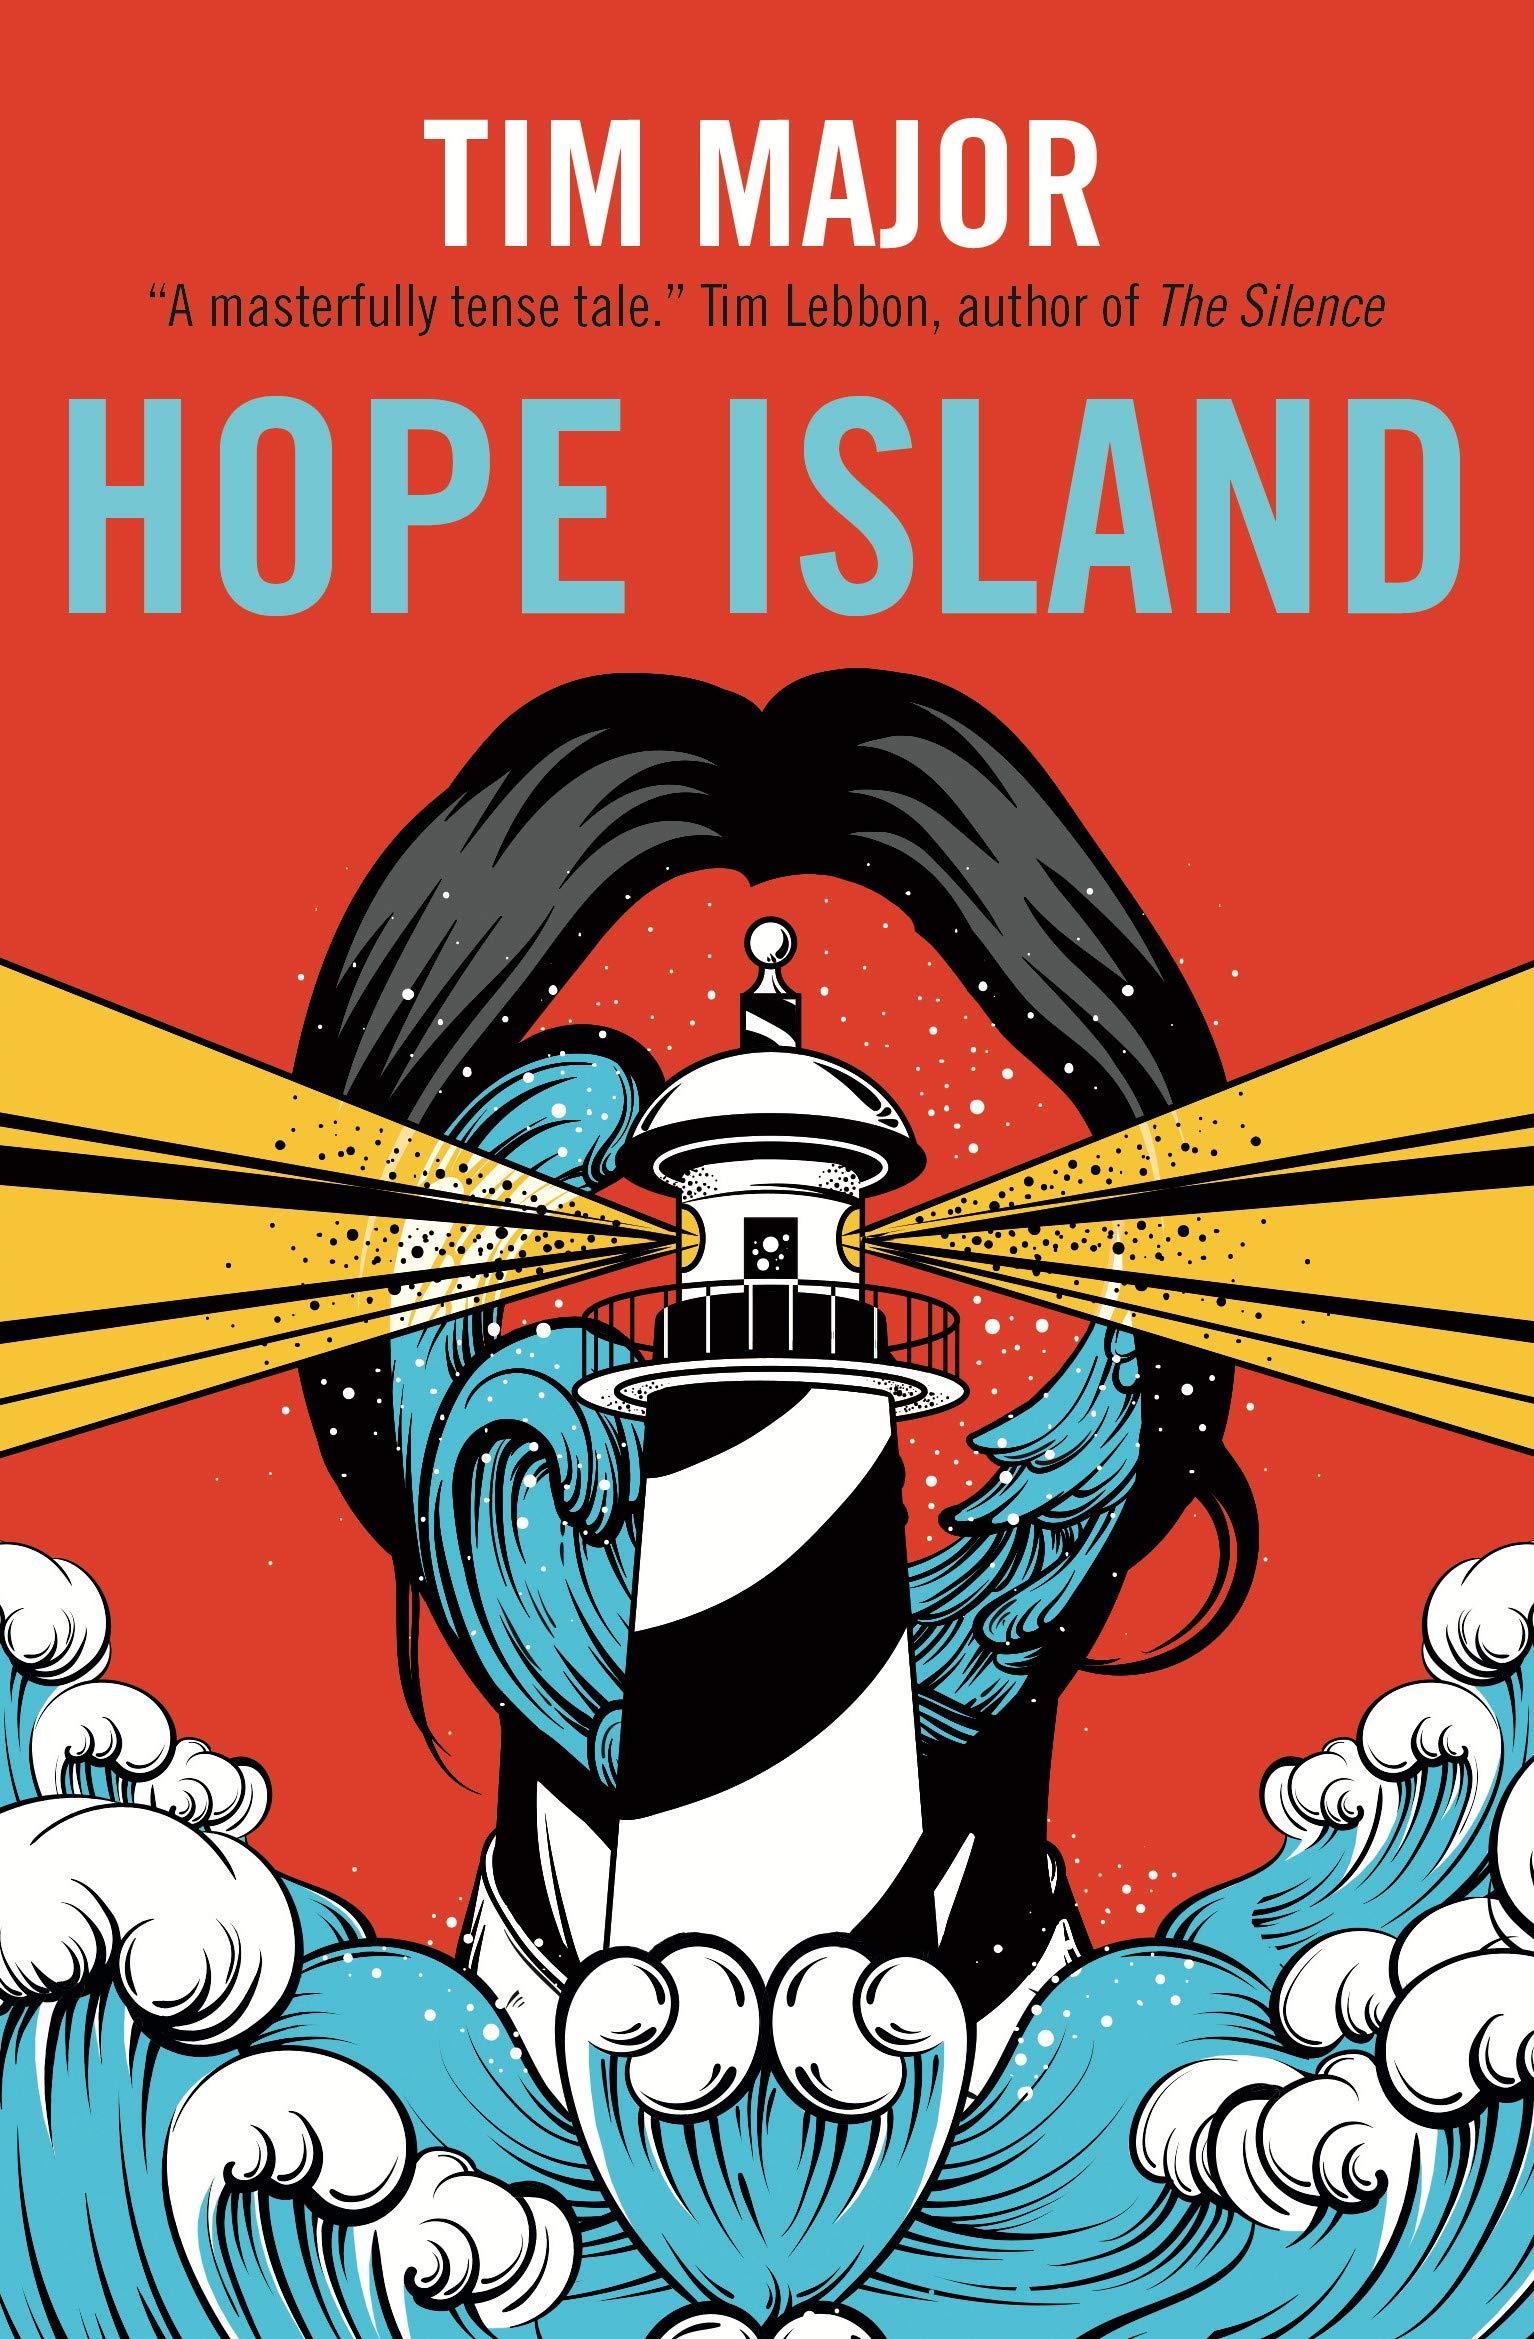 Hope Island by Tim Major